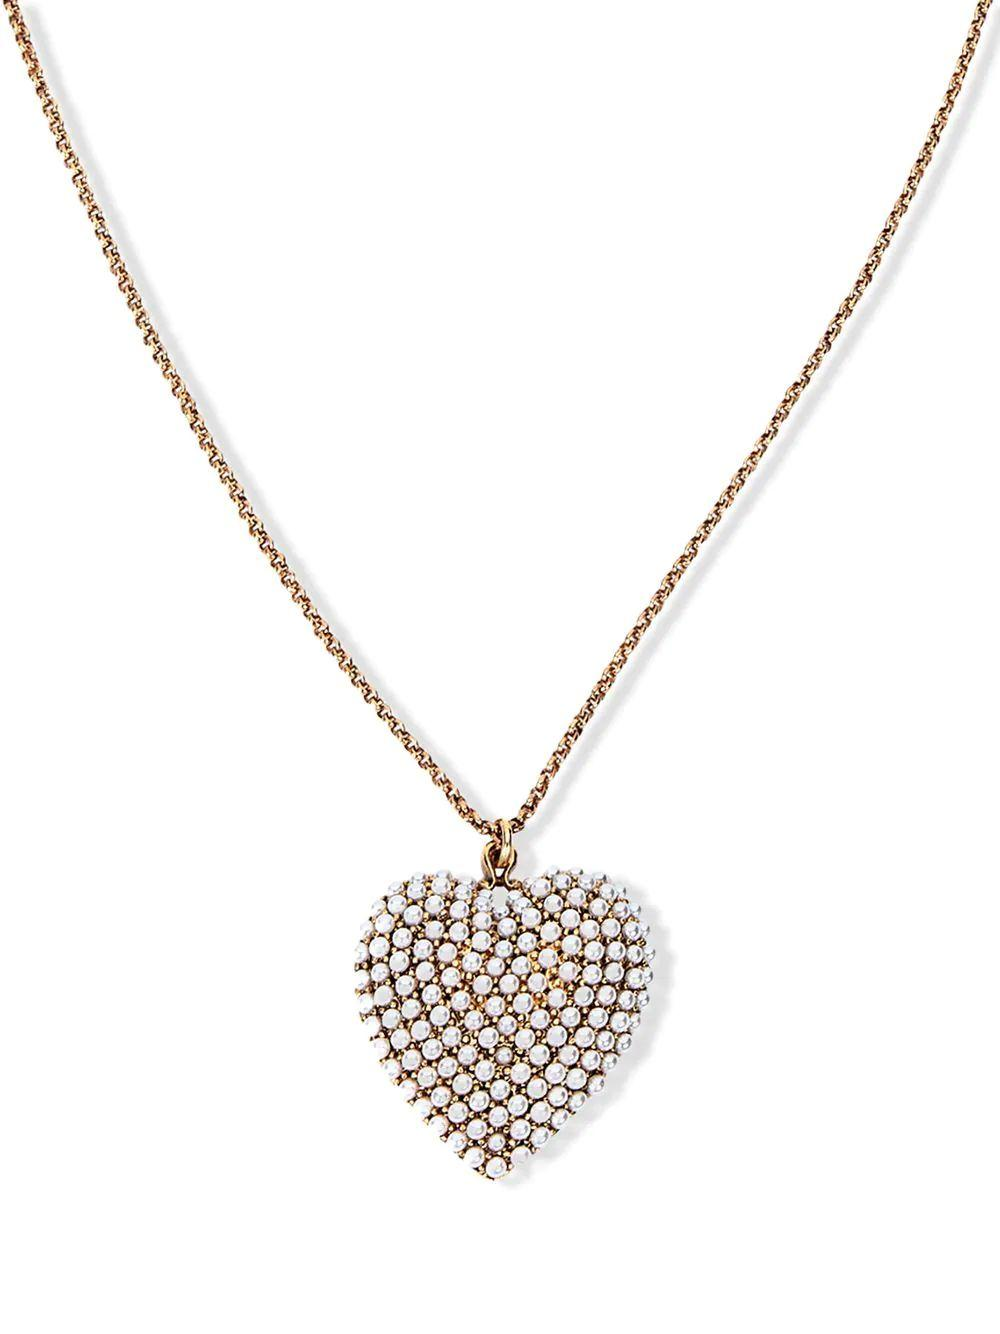 Greta Heart Pendant Necklace Item # 111PA13